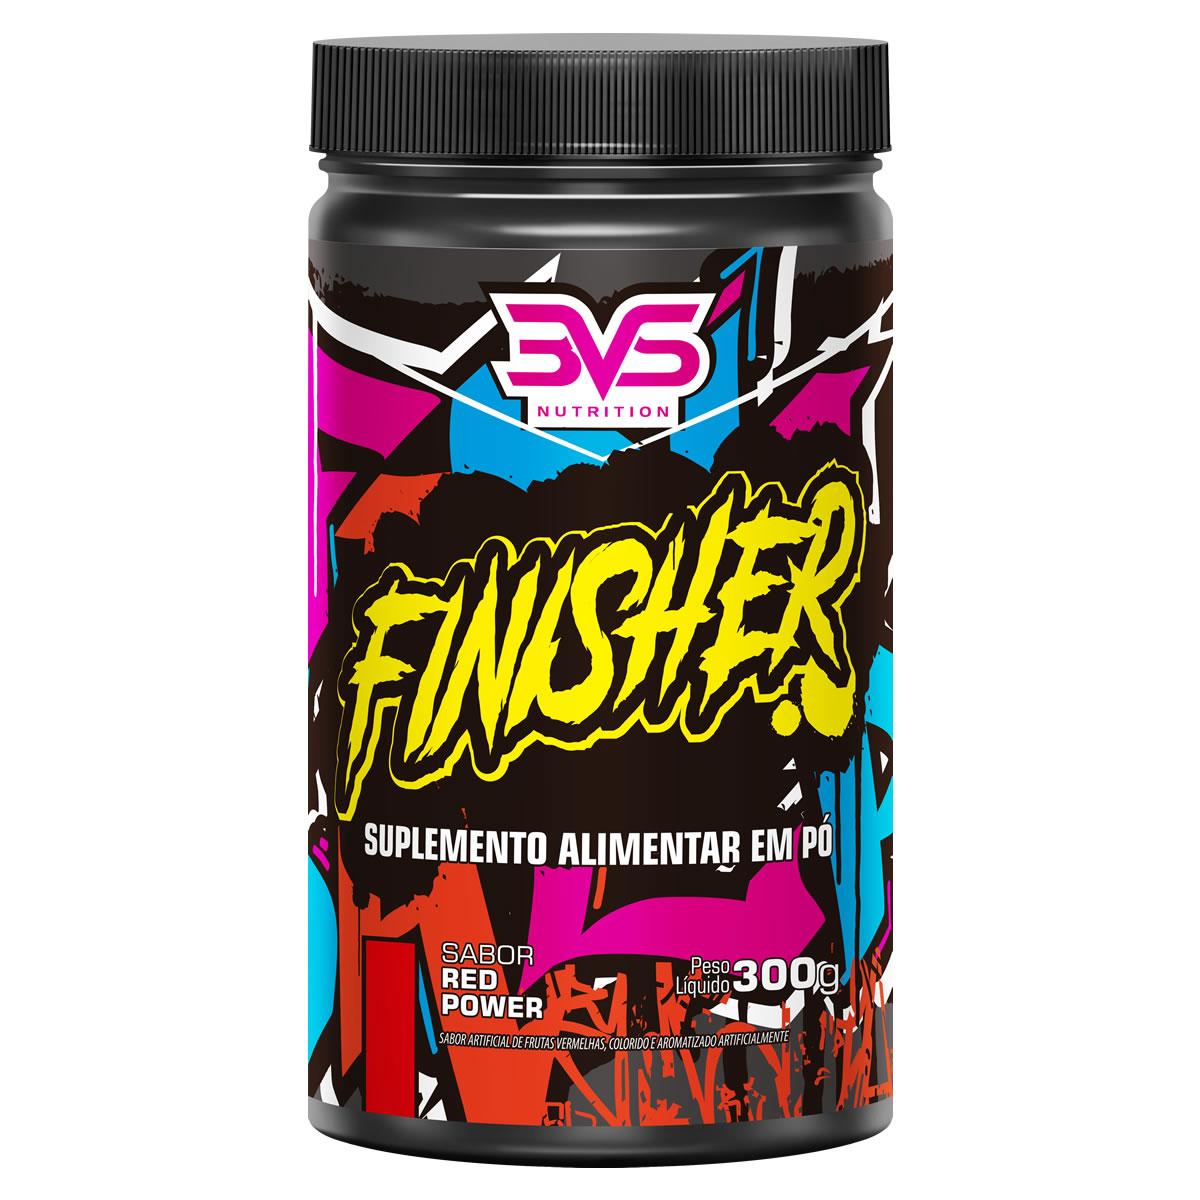 Pós Treino Finisher 300g - 3VS Nutrition Finisher